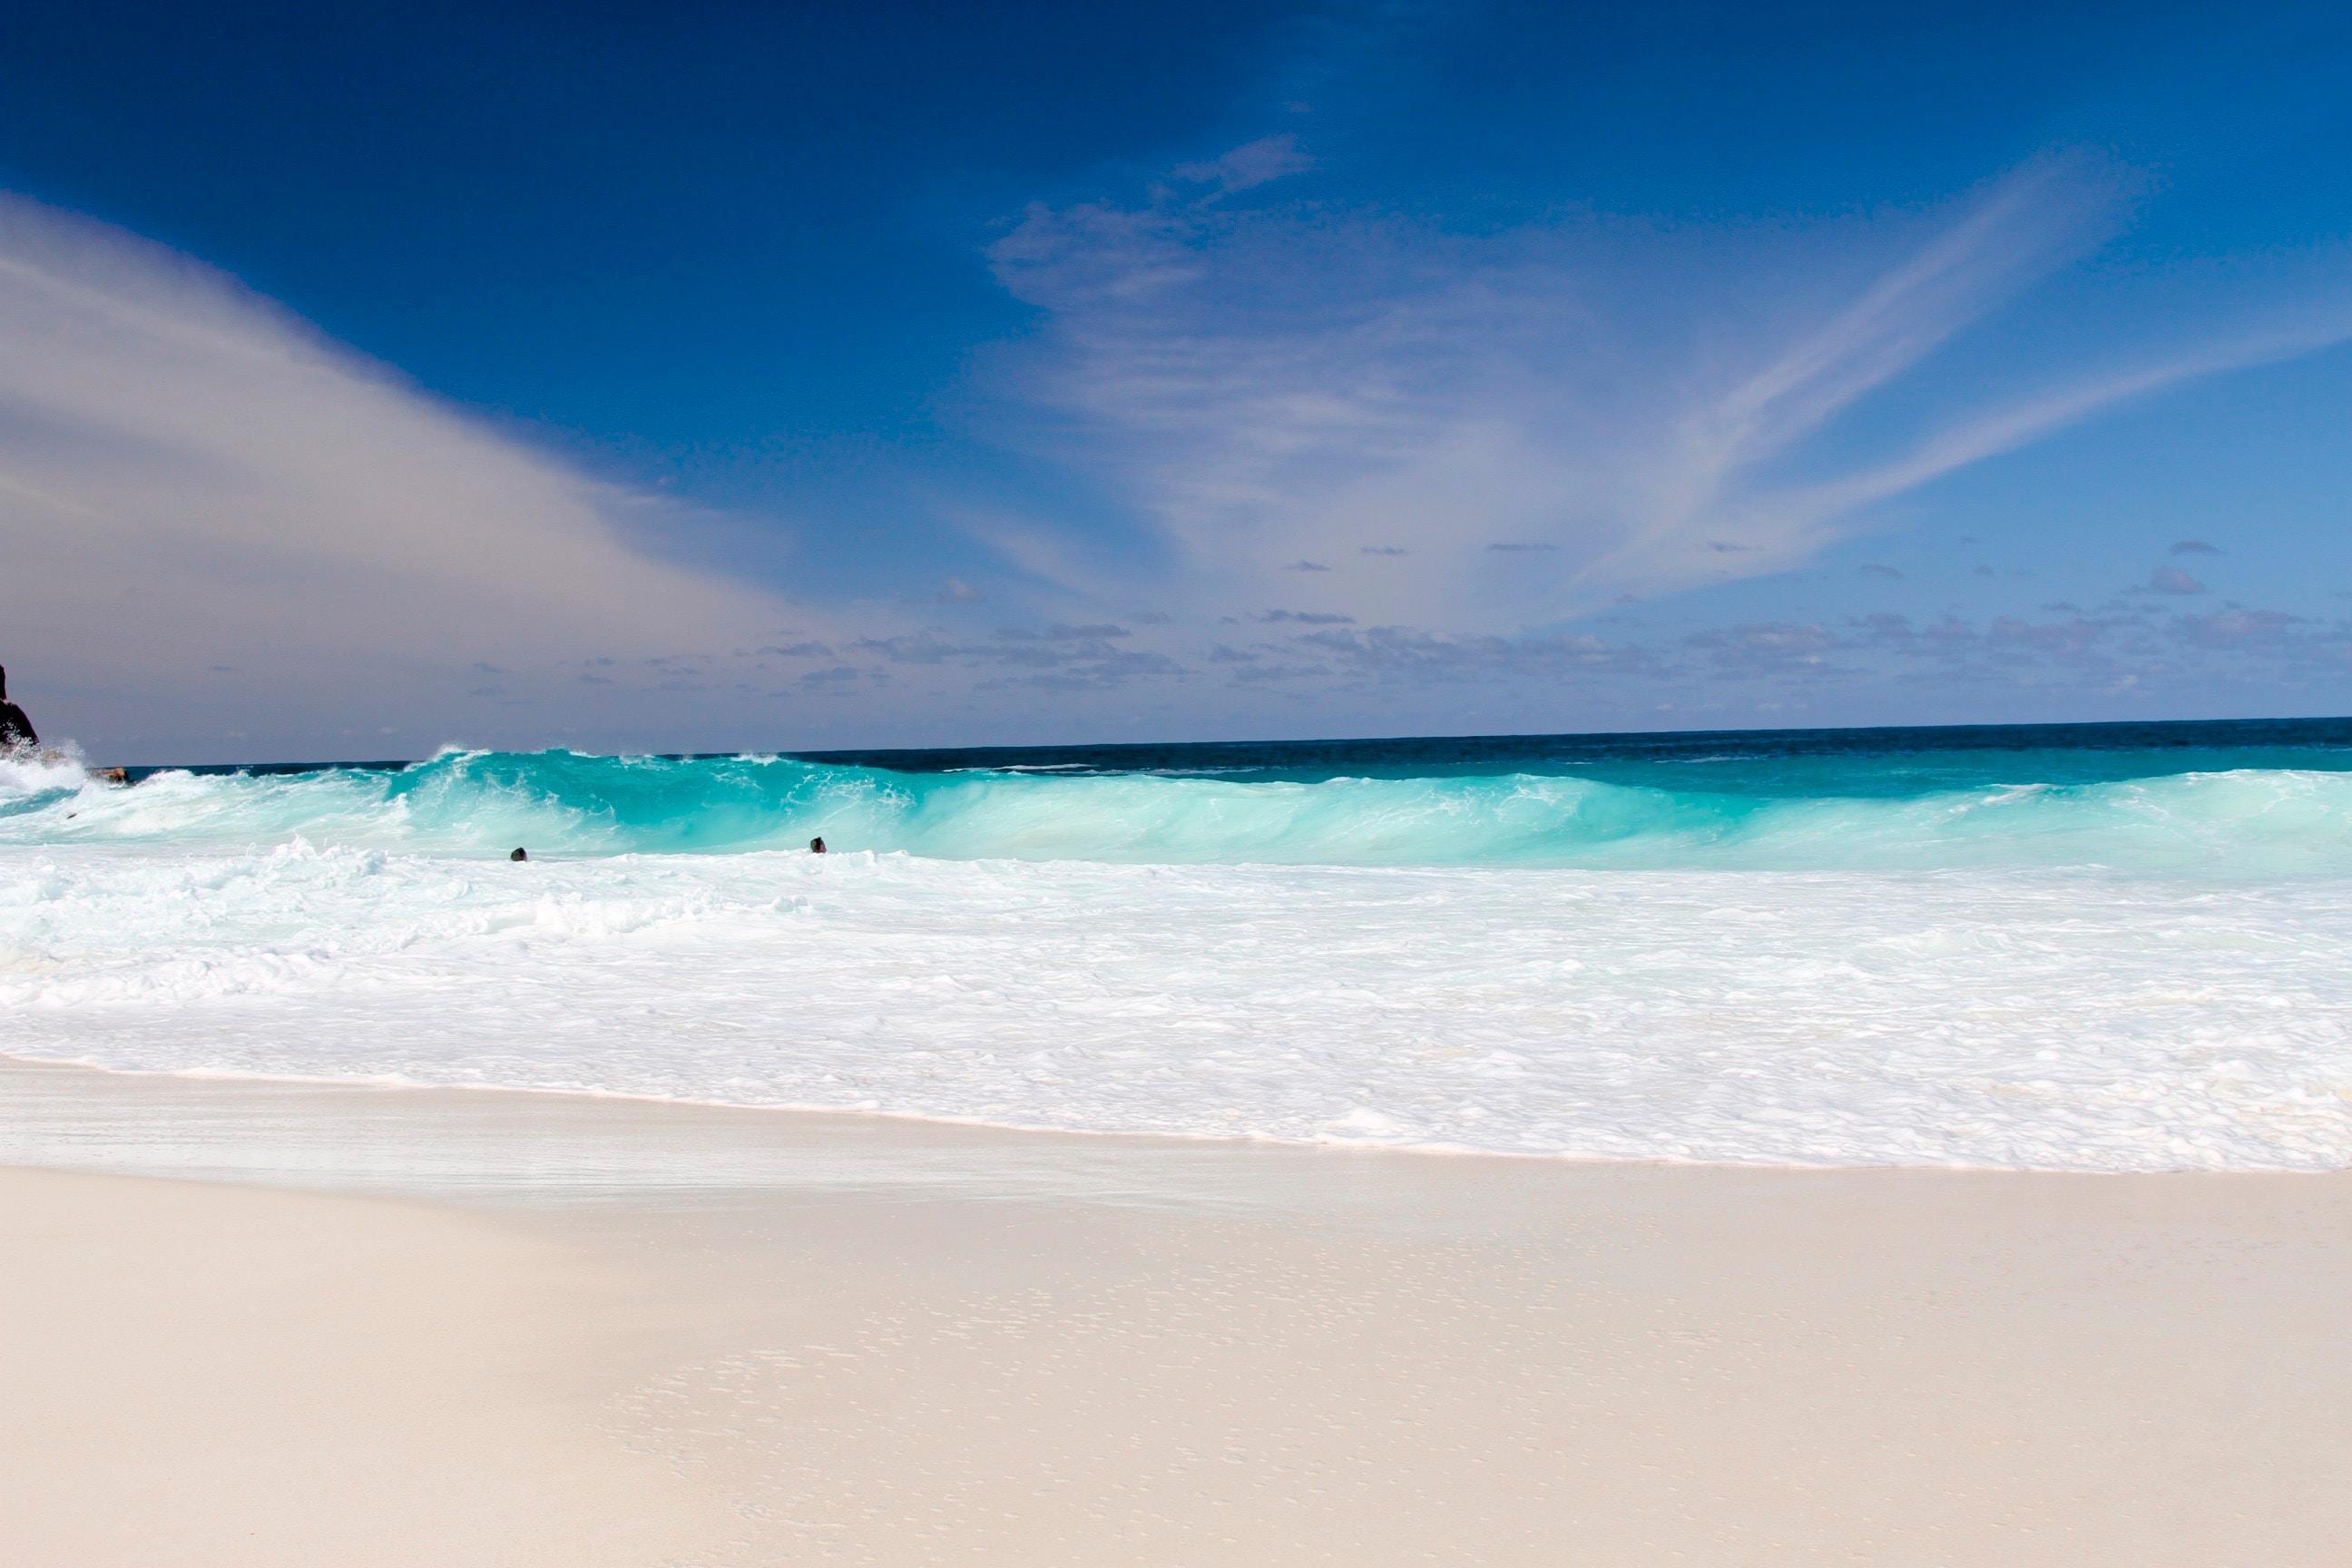 Blue ocean waves splashing on a tropical sand beach at Seychelles